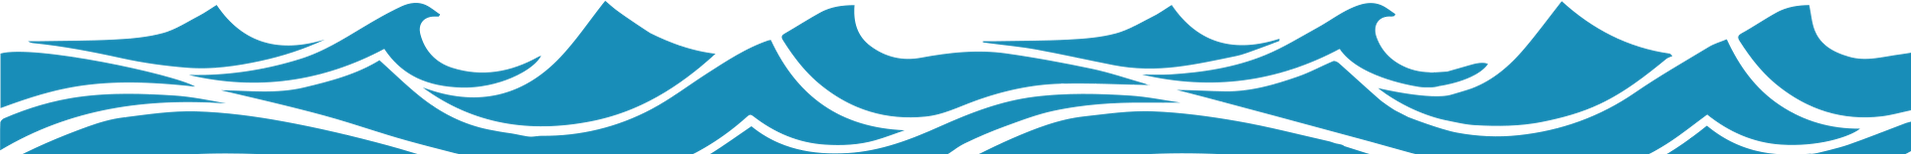 creative-wave-web-banner-wave-divider_ed